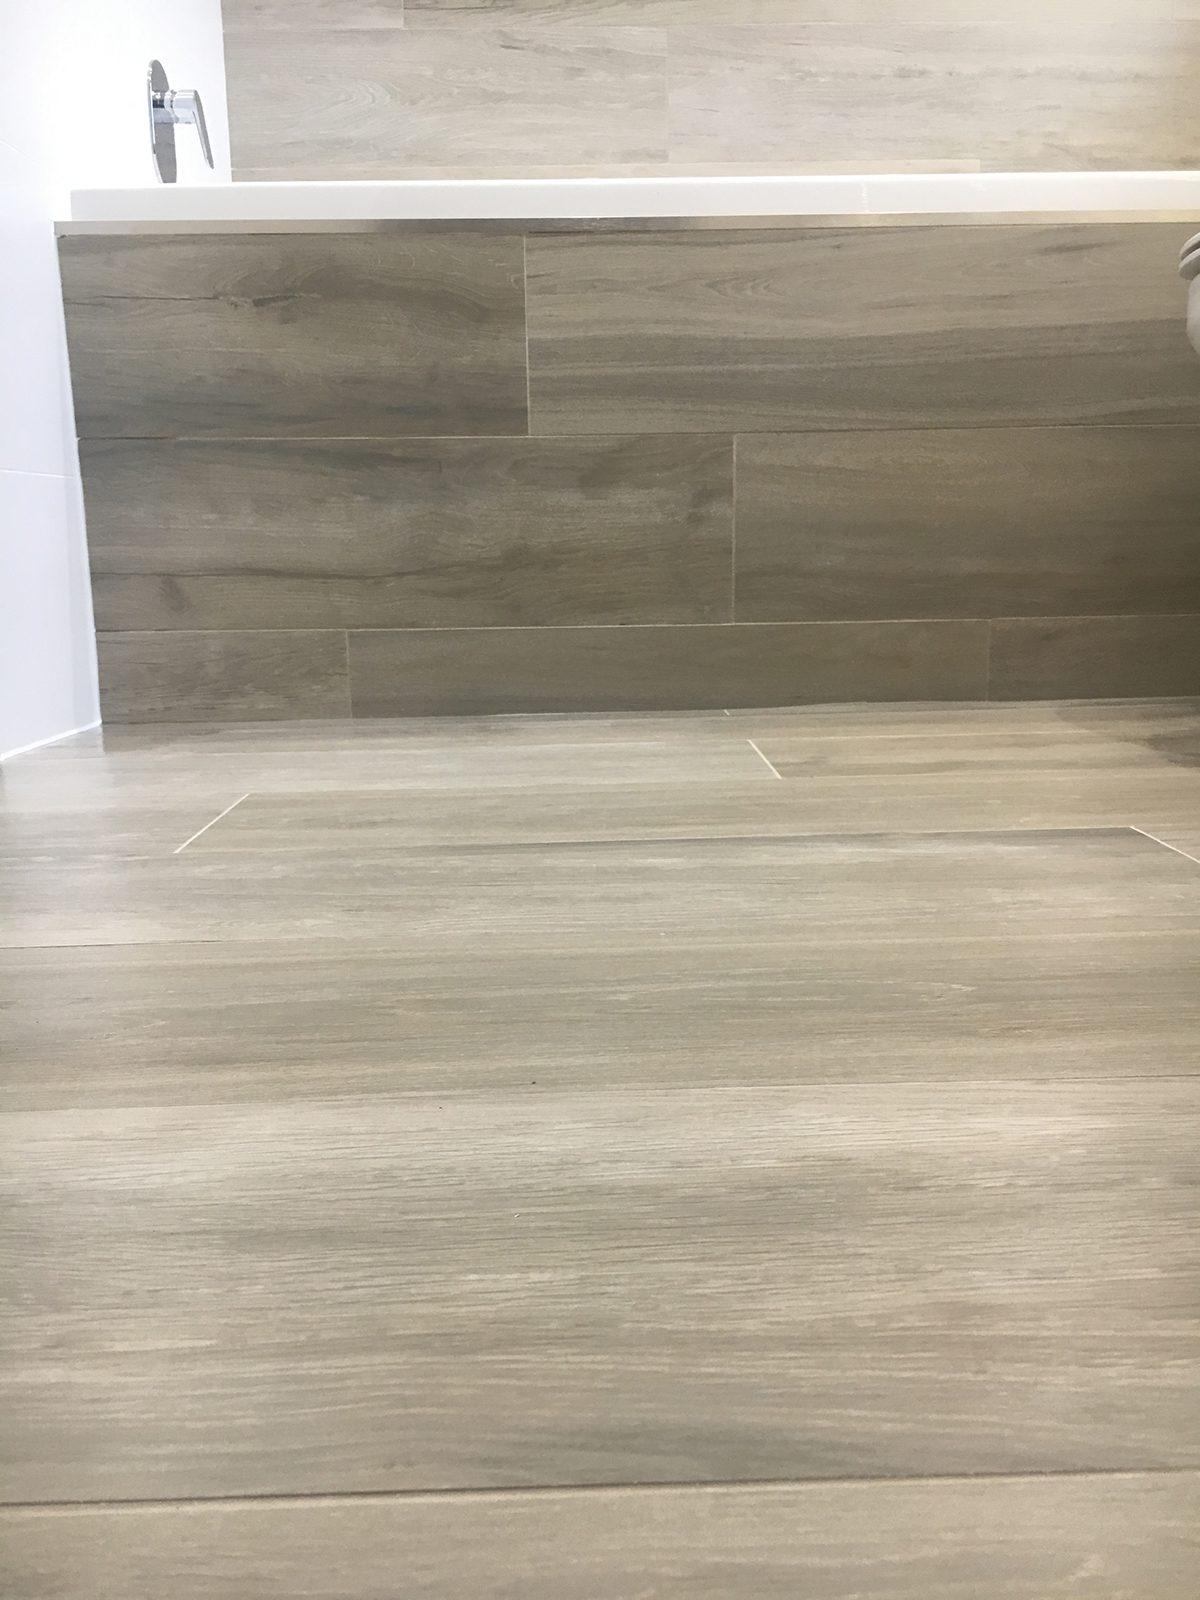 Bathroom fitting wet room tiling